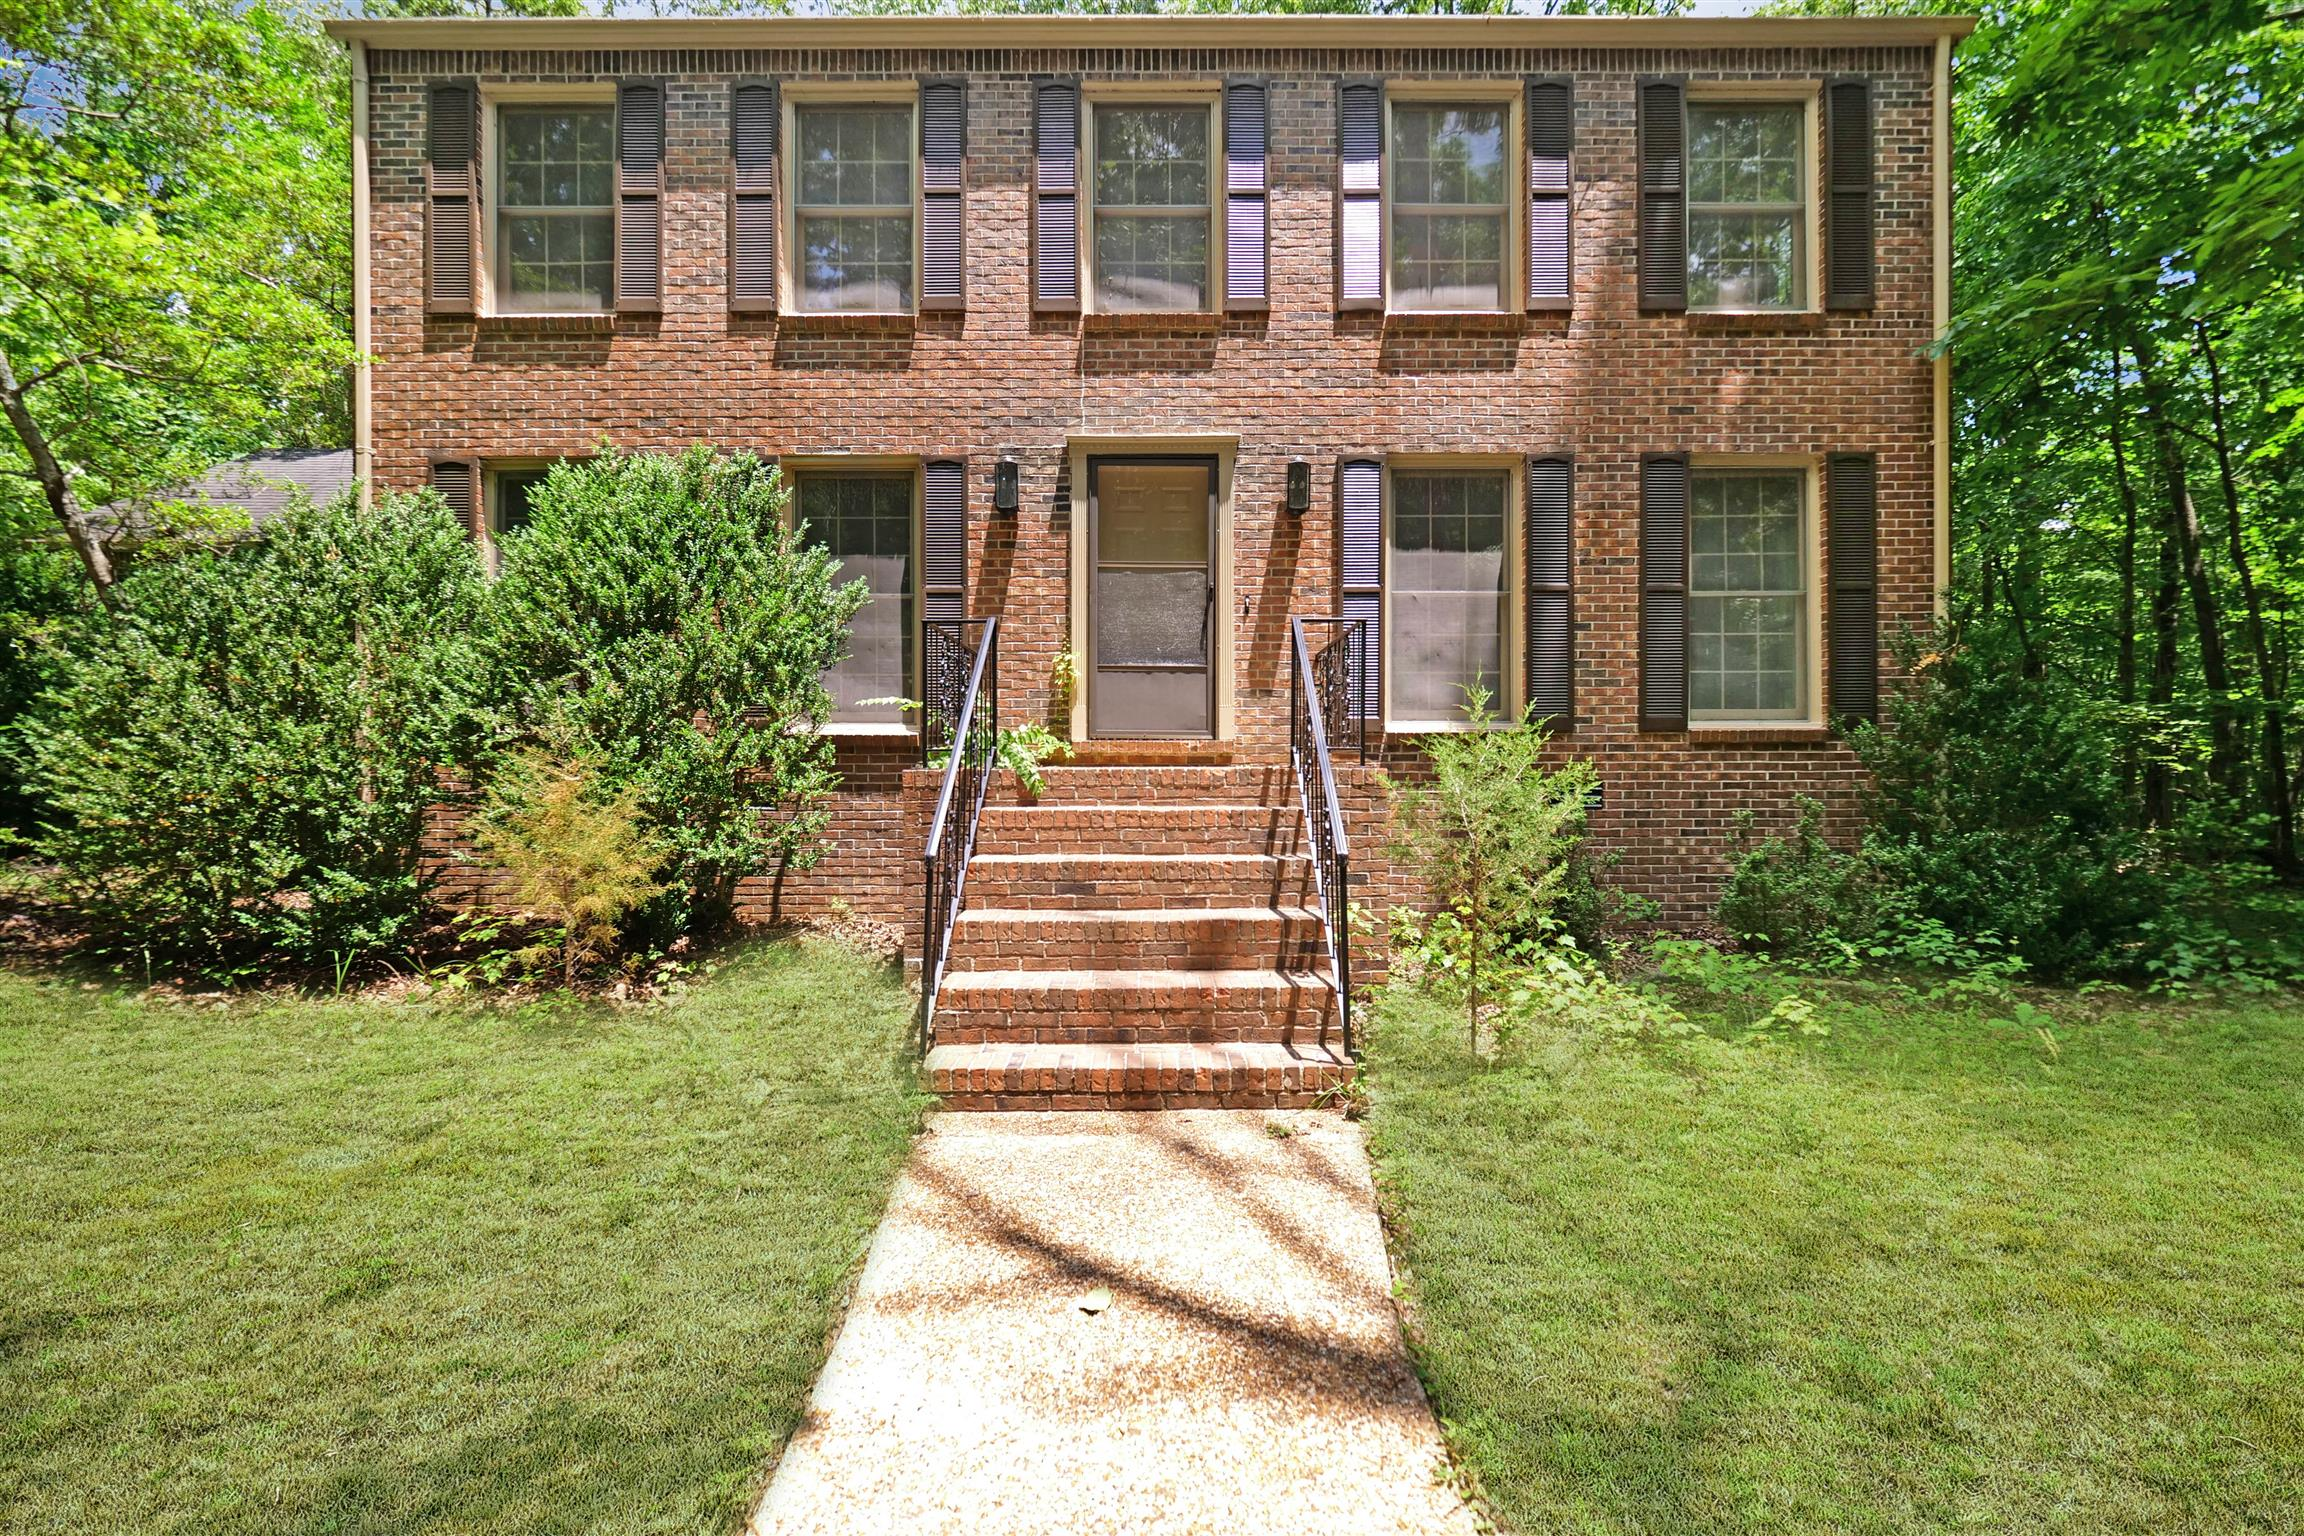 521 Huckleberry Pl, Monteagle, TN 37356 - Monteagle, TN real estate listing